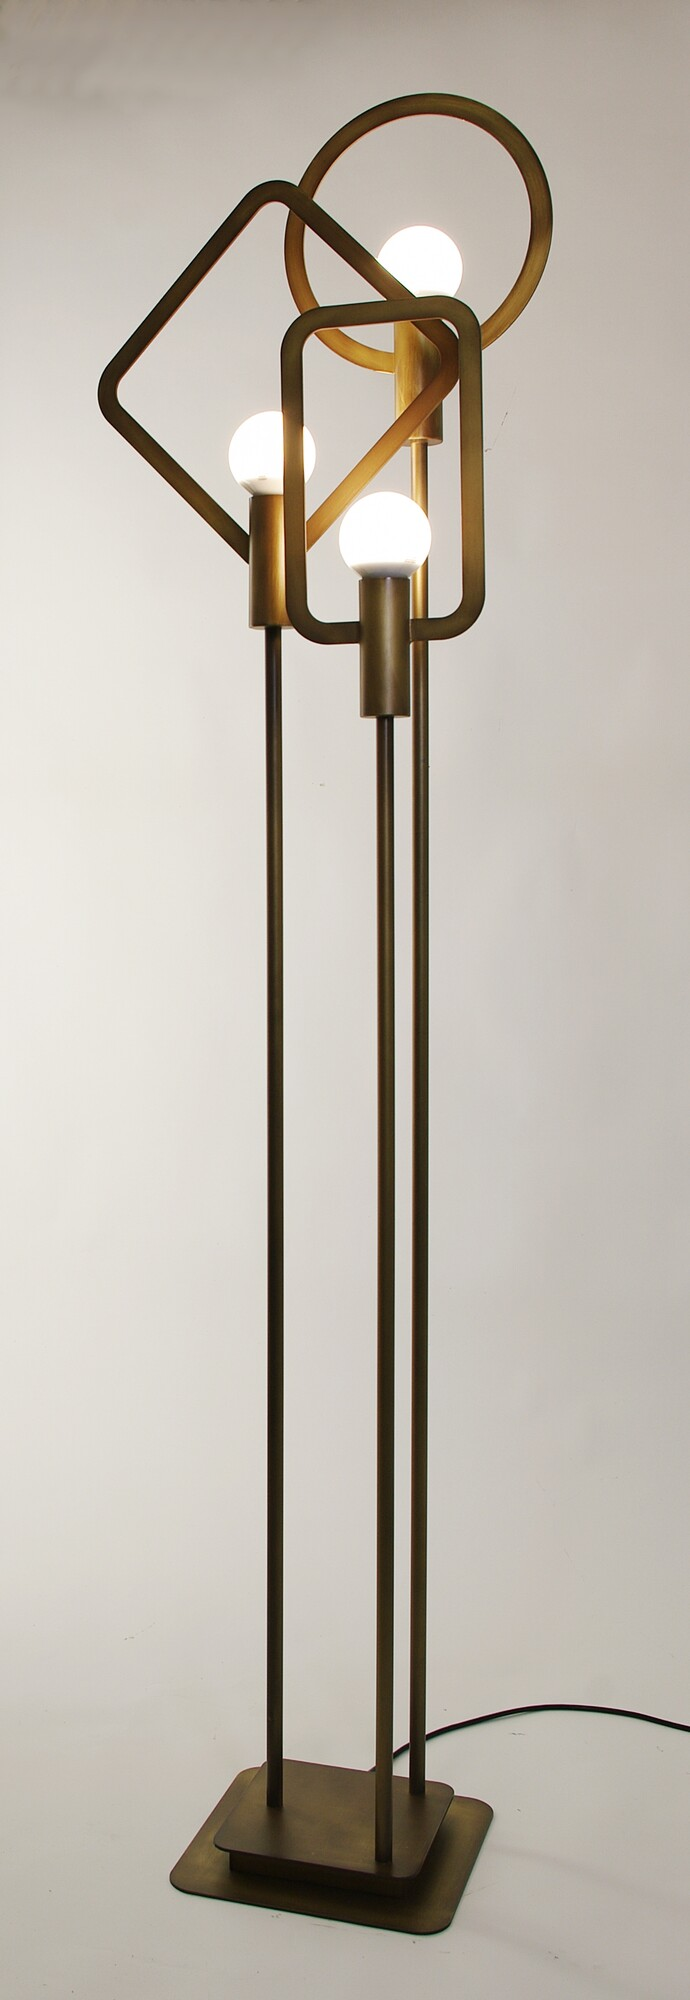 CARTESIO Vloerlamp E27 3x Koper